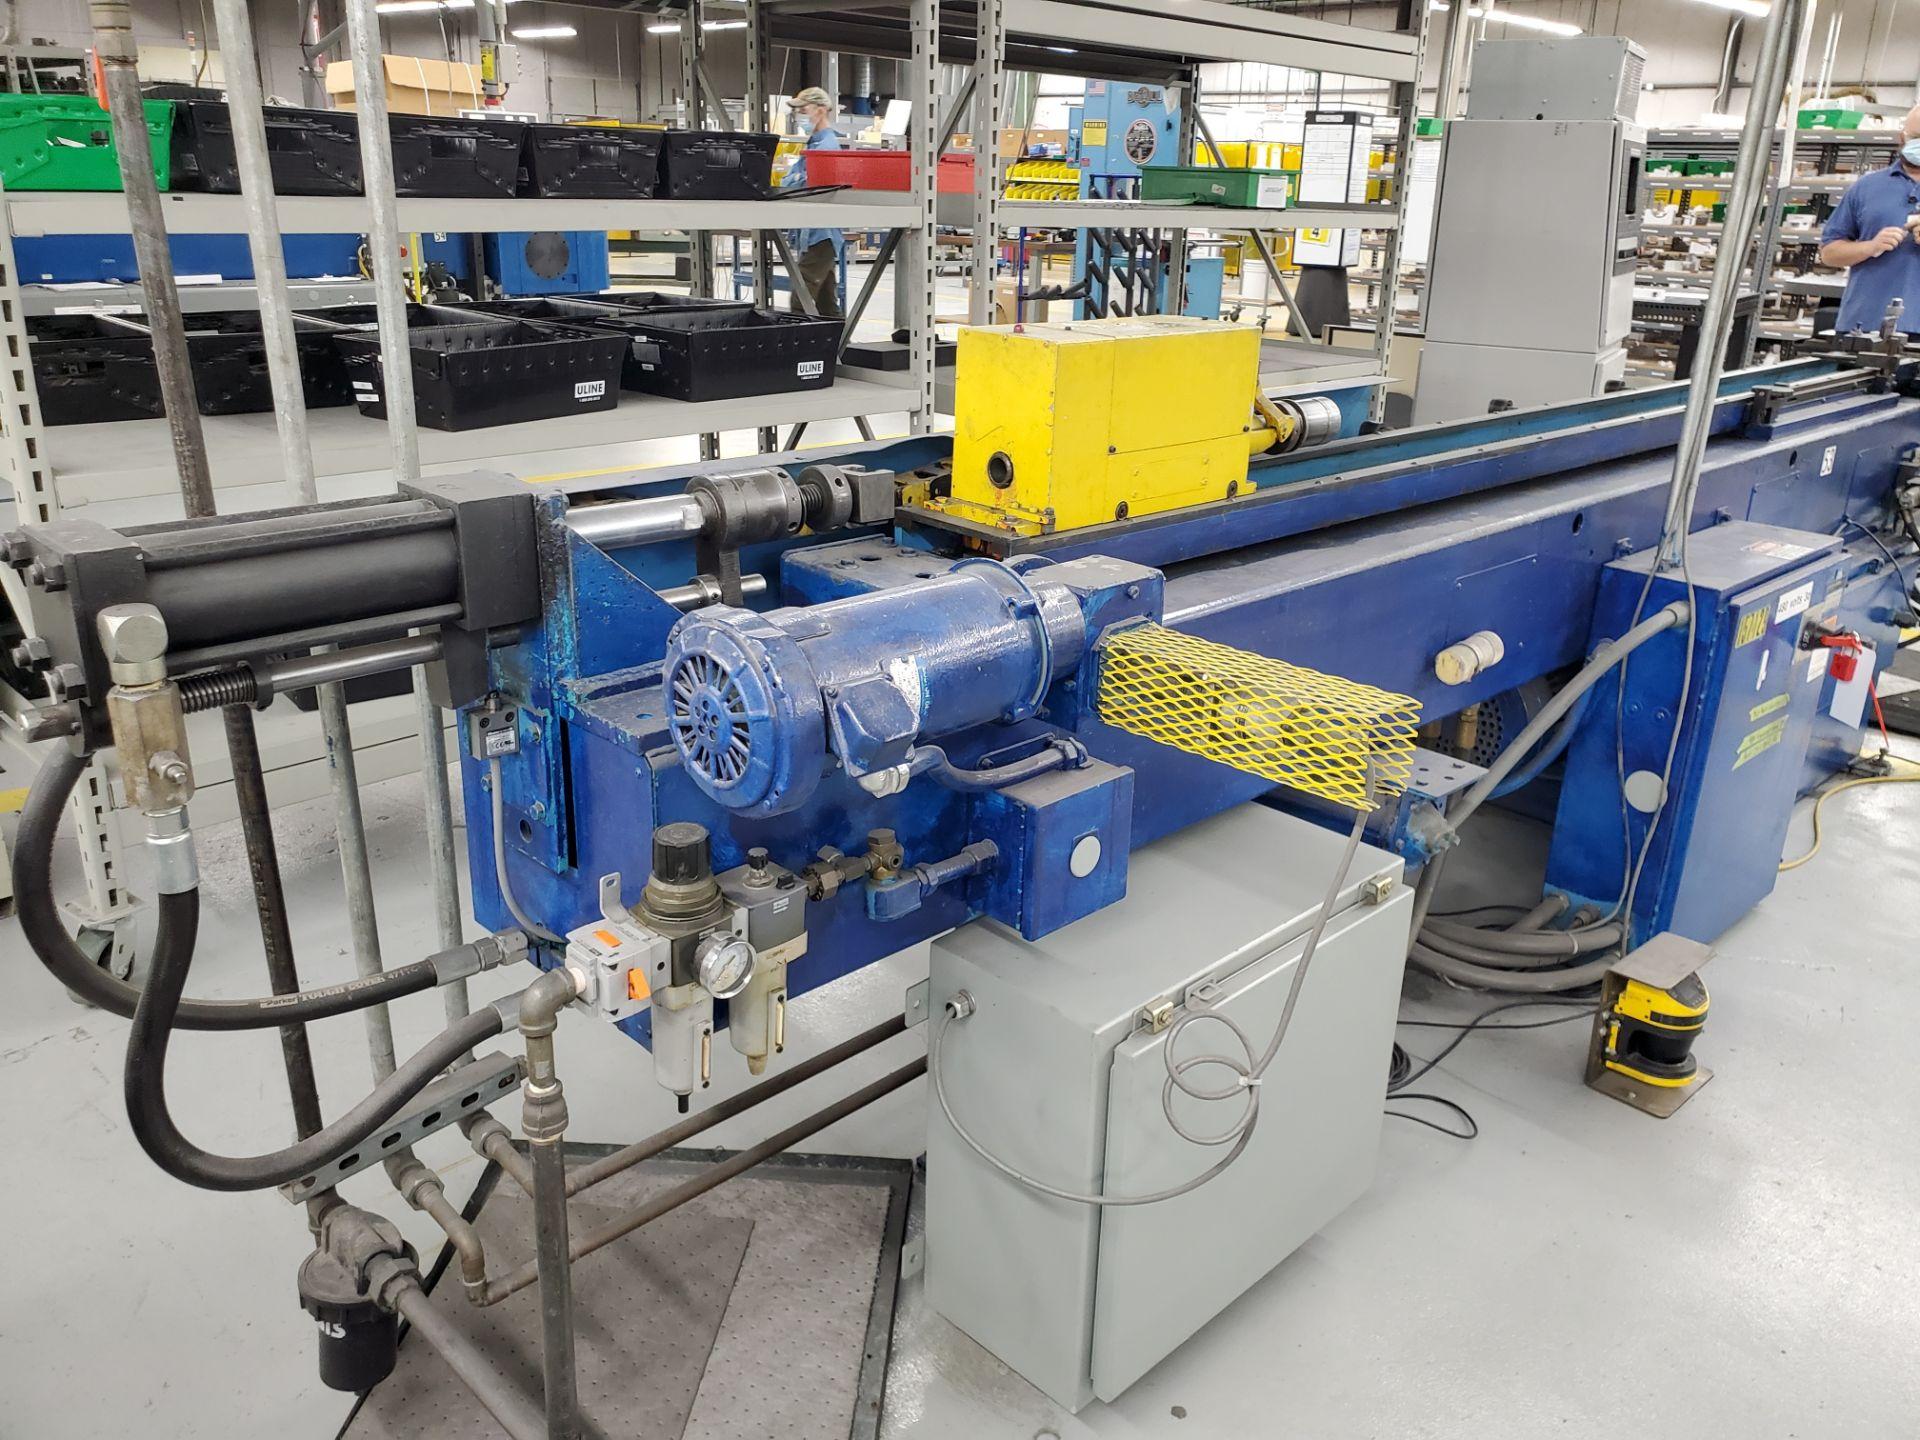 CNC Model VB75-GP Eaton Leonard Tube Bender, S/N VB75-55-GL - Image 11 of 17